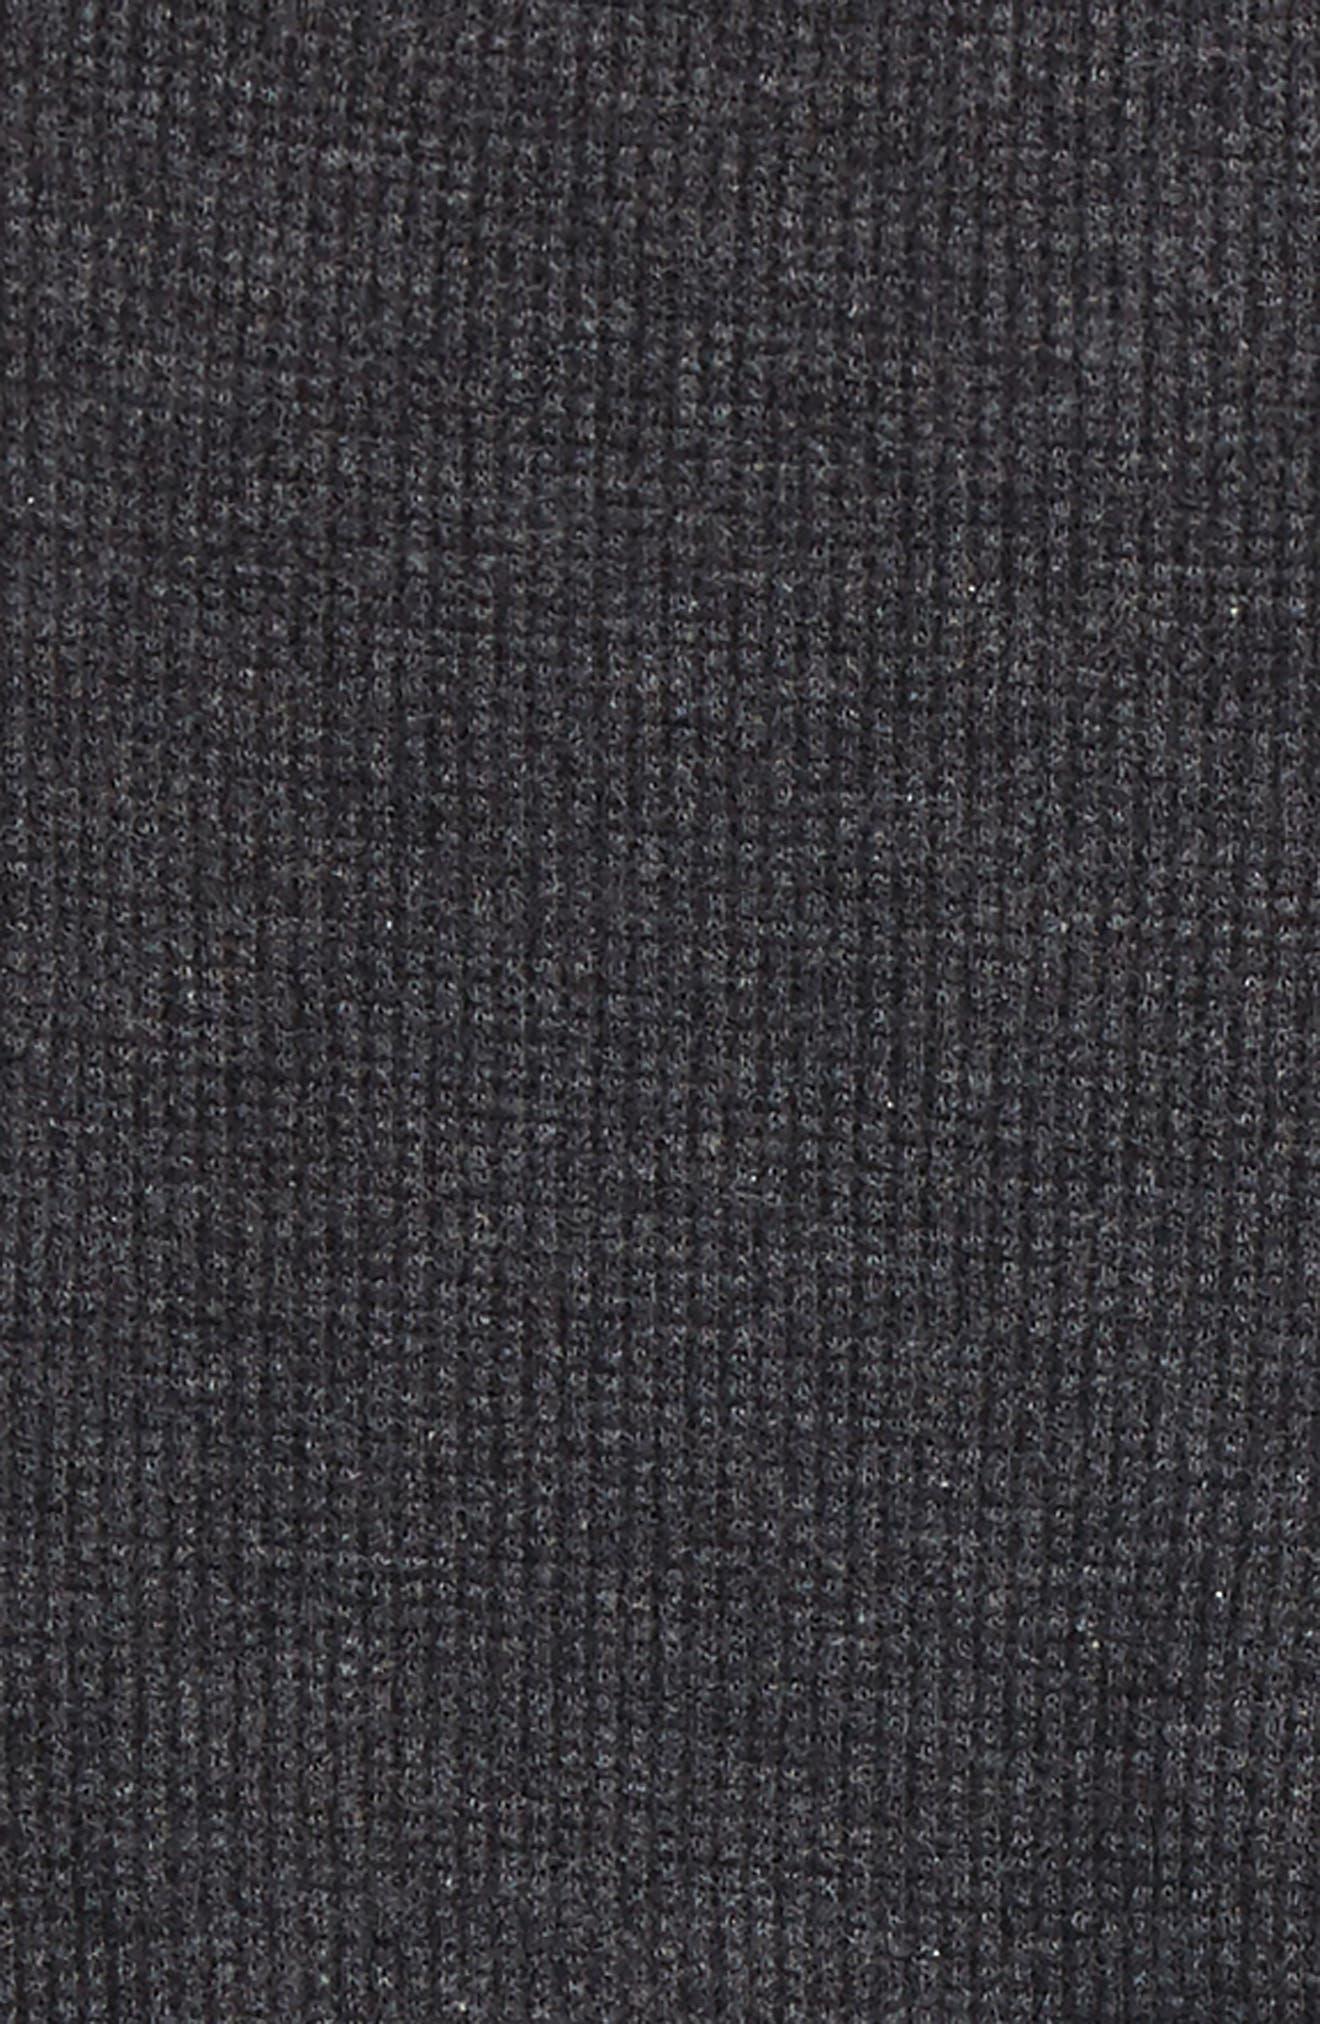 Thermal Ruffle Skater Dress & Leggings Set,                             Alternate thumbnail 2, color,                             024